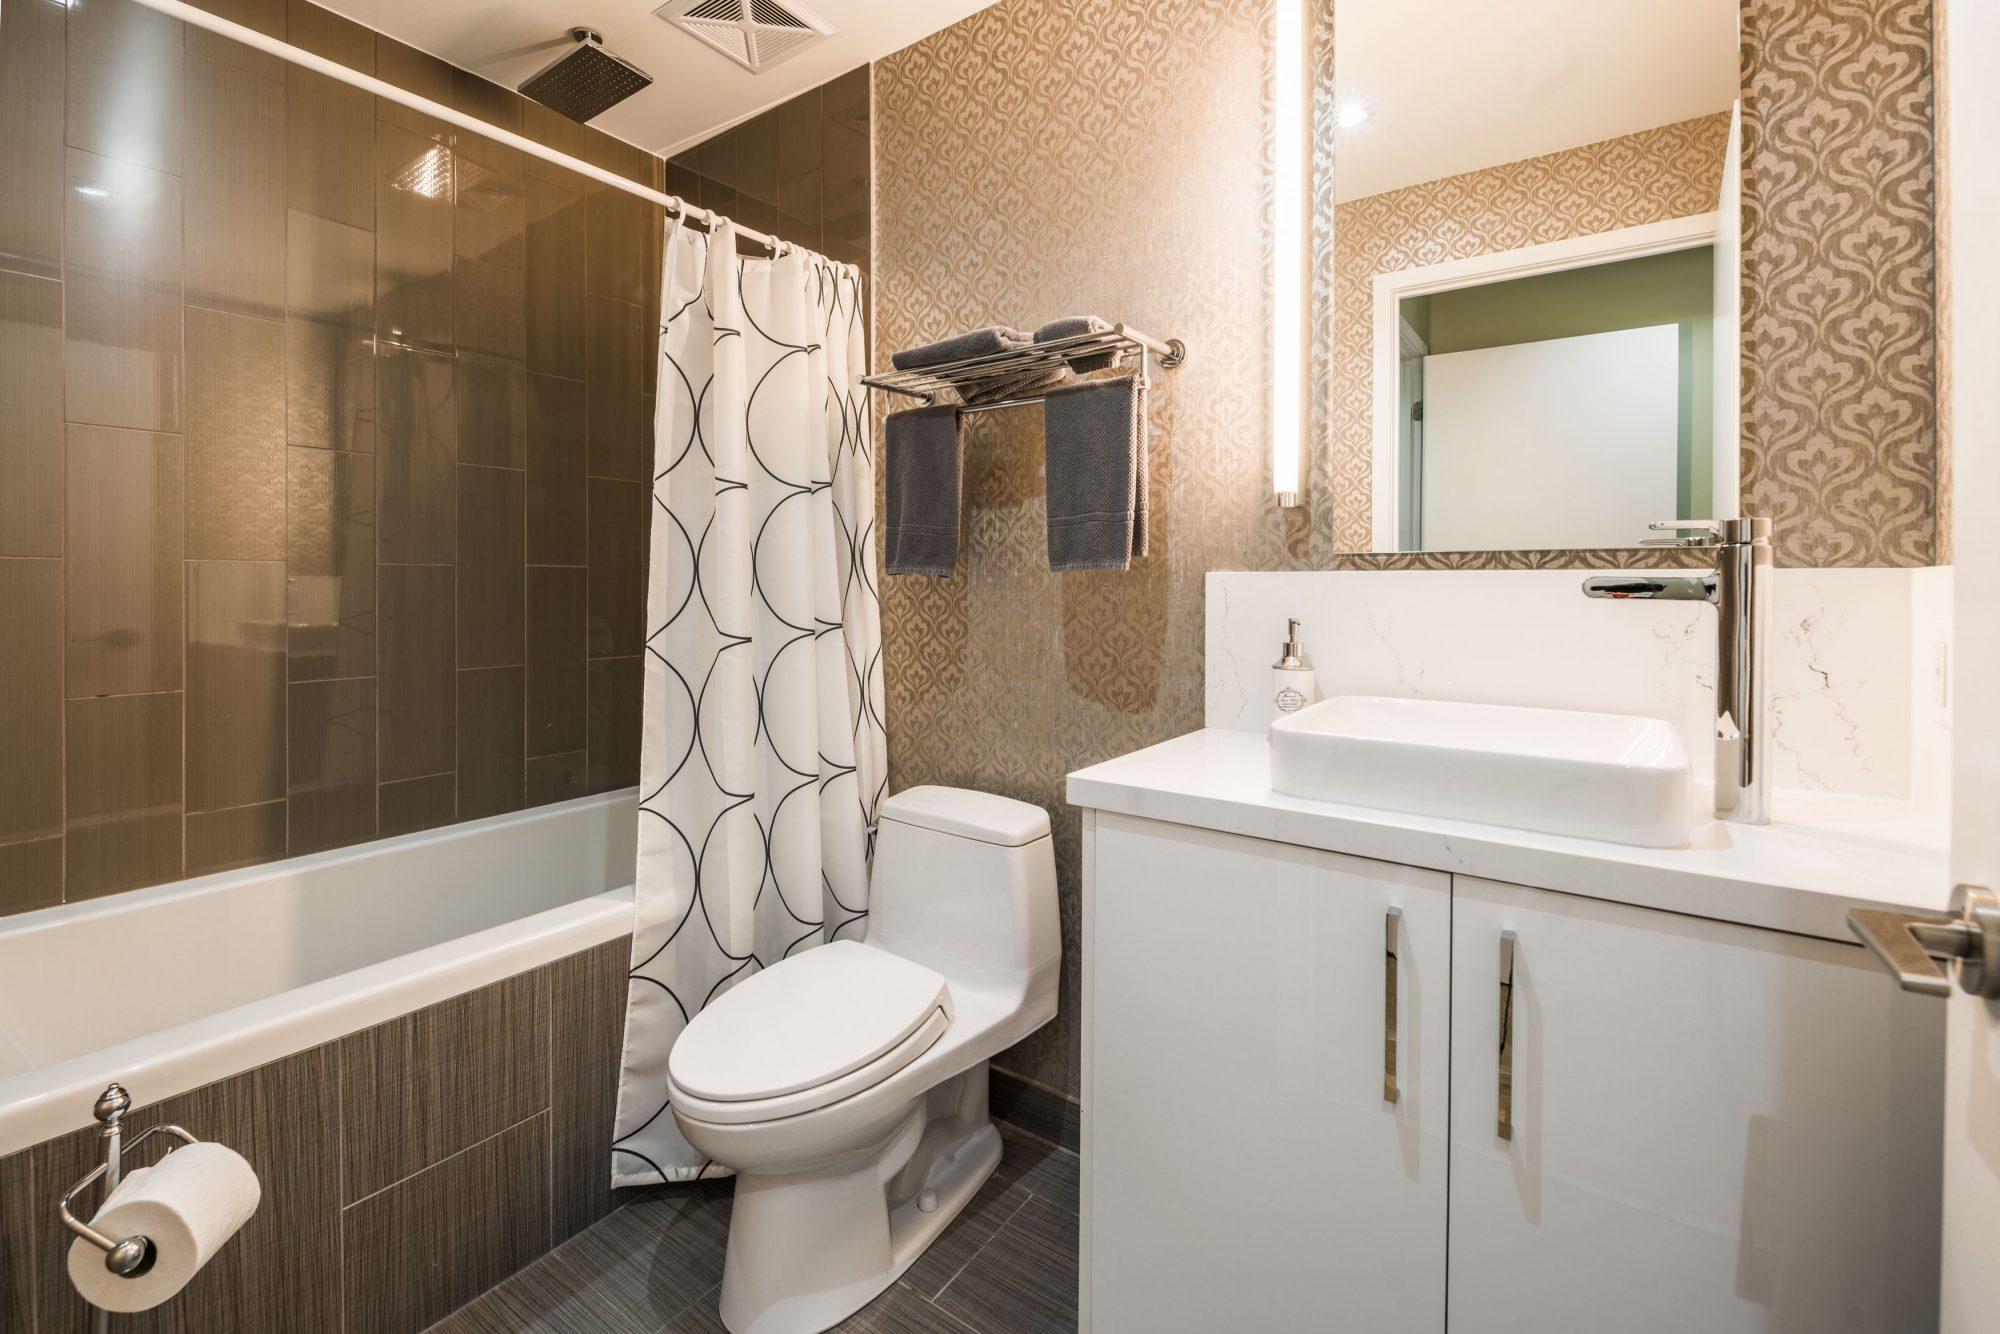 toronto-apartment-for-rent-25-oxley-street-5